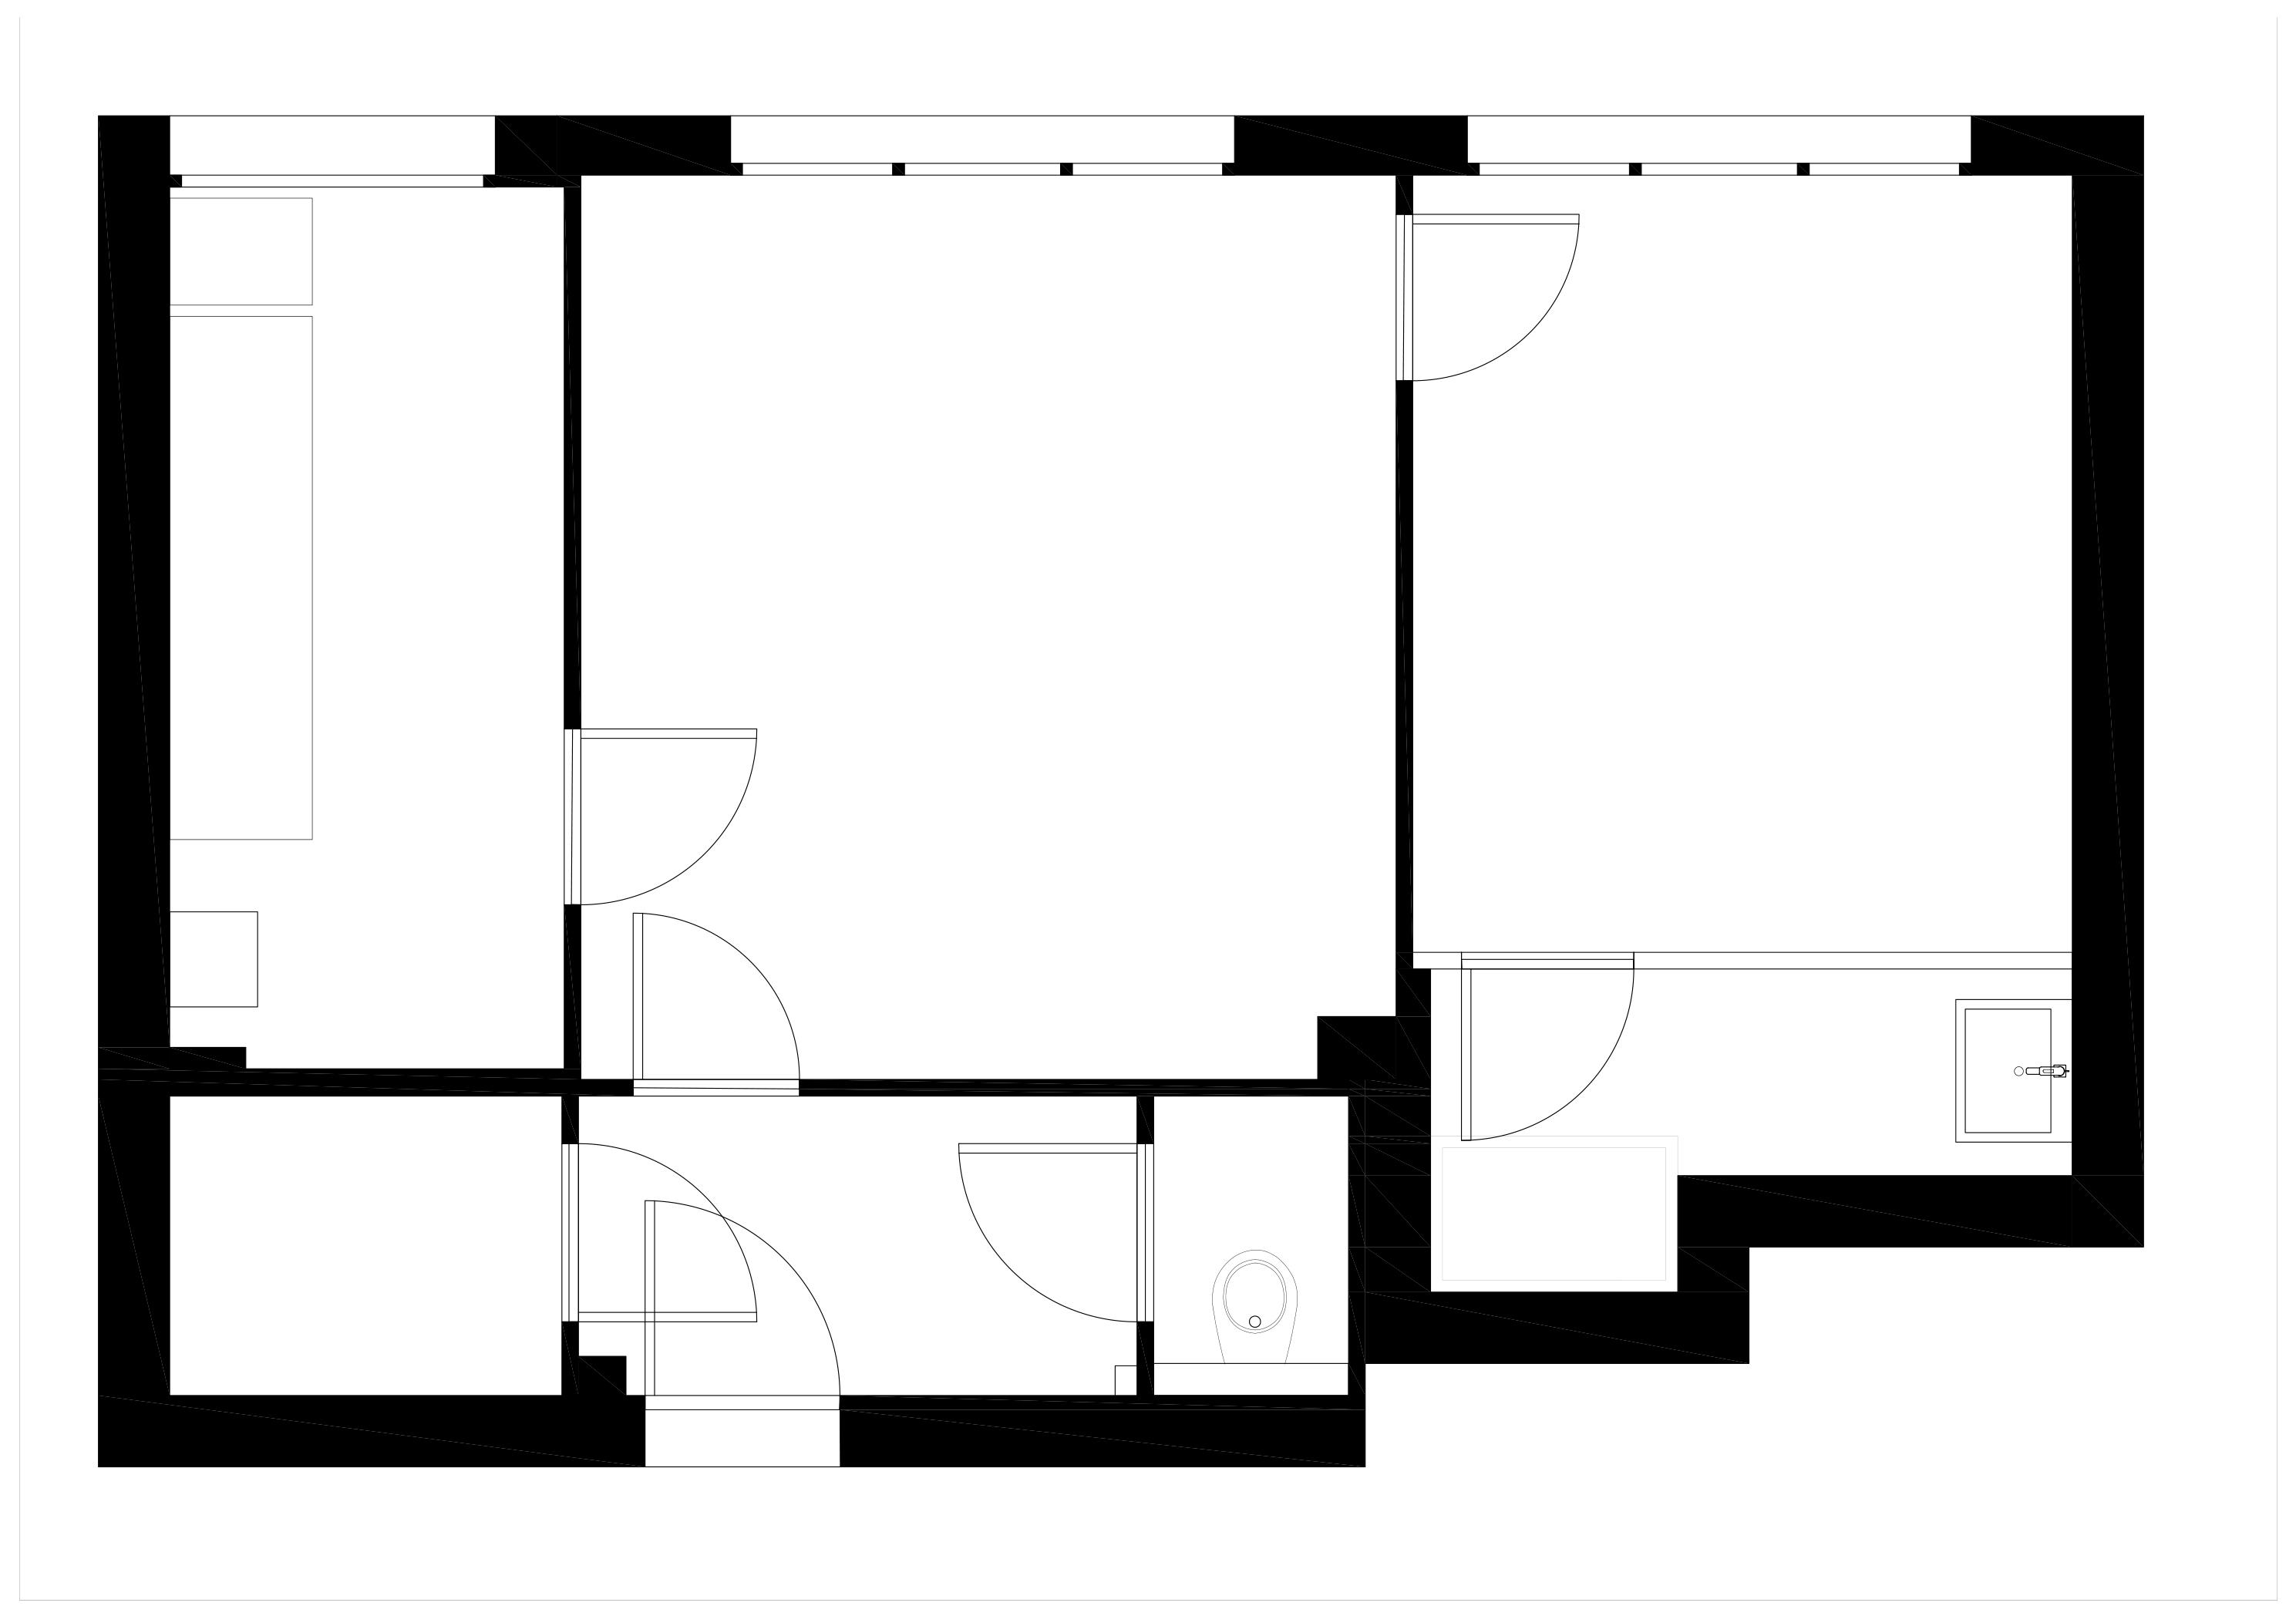 D:FREELANCEFONTENAYDWGprojet-fontenay plan site (1)